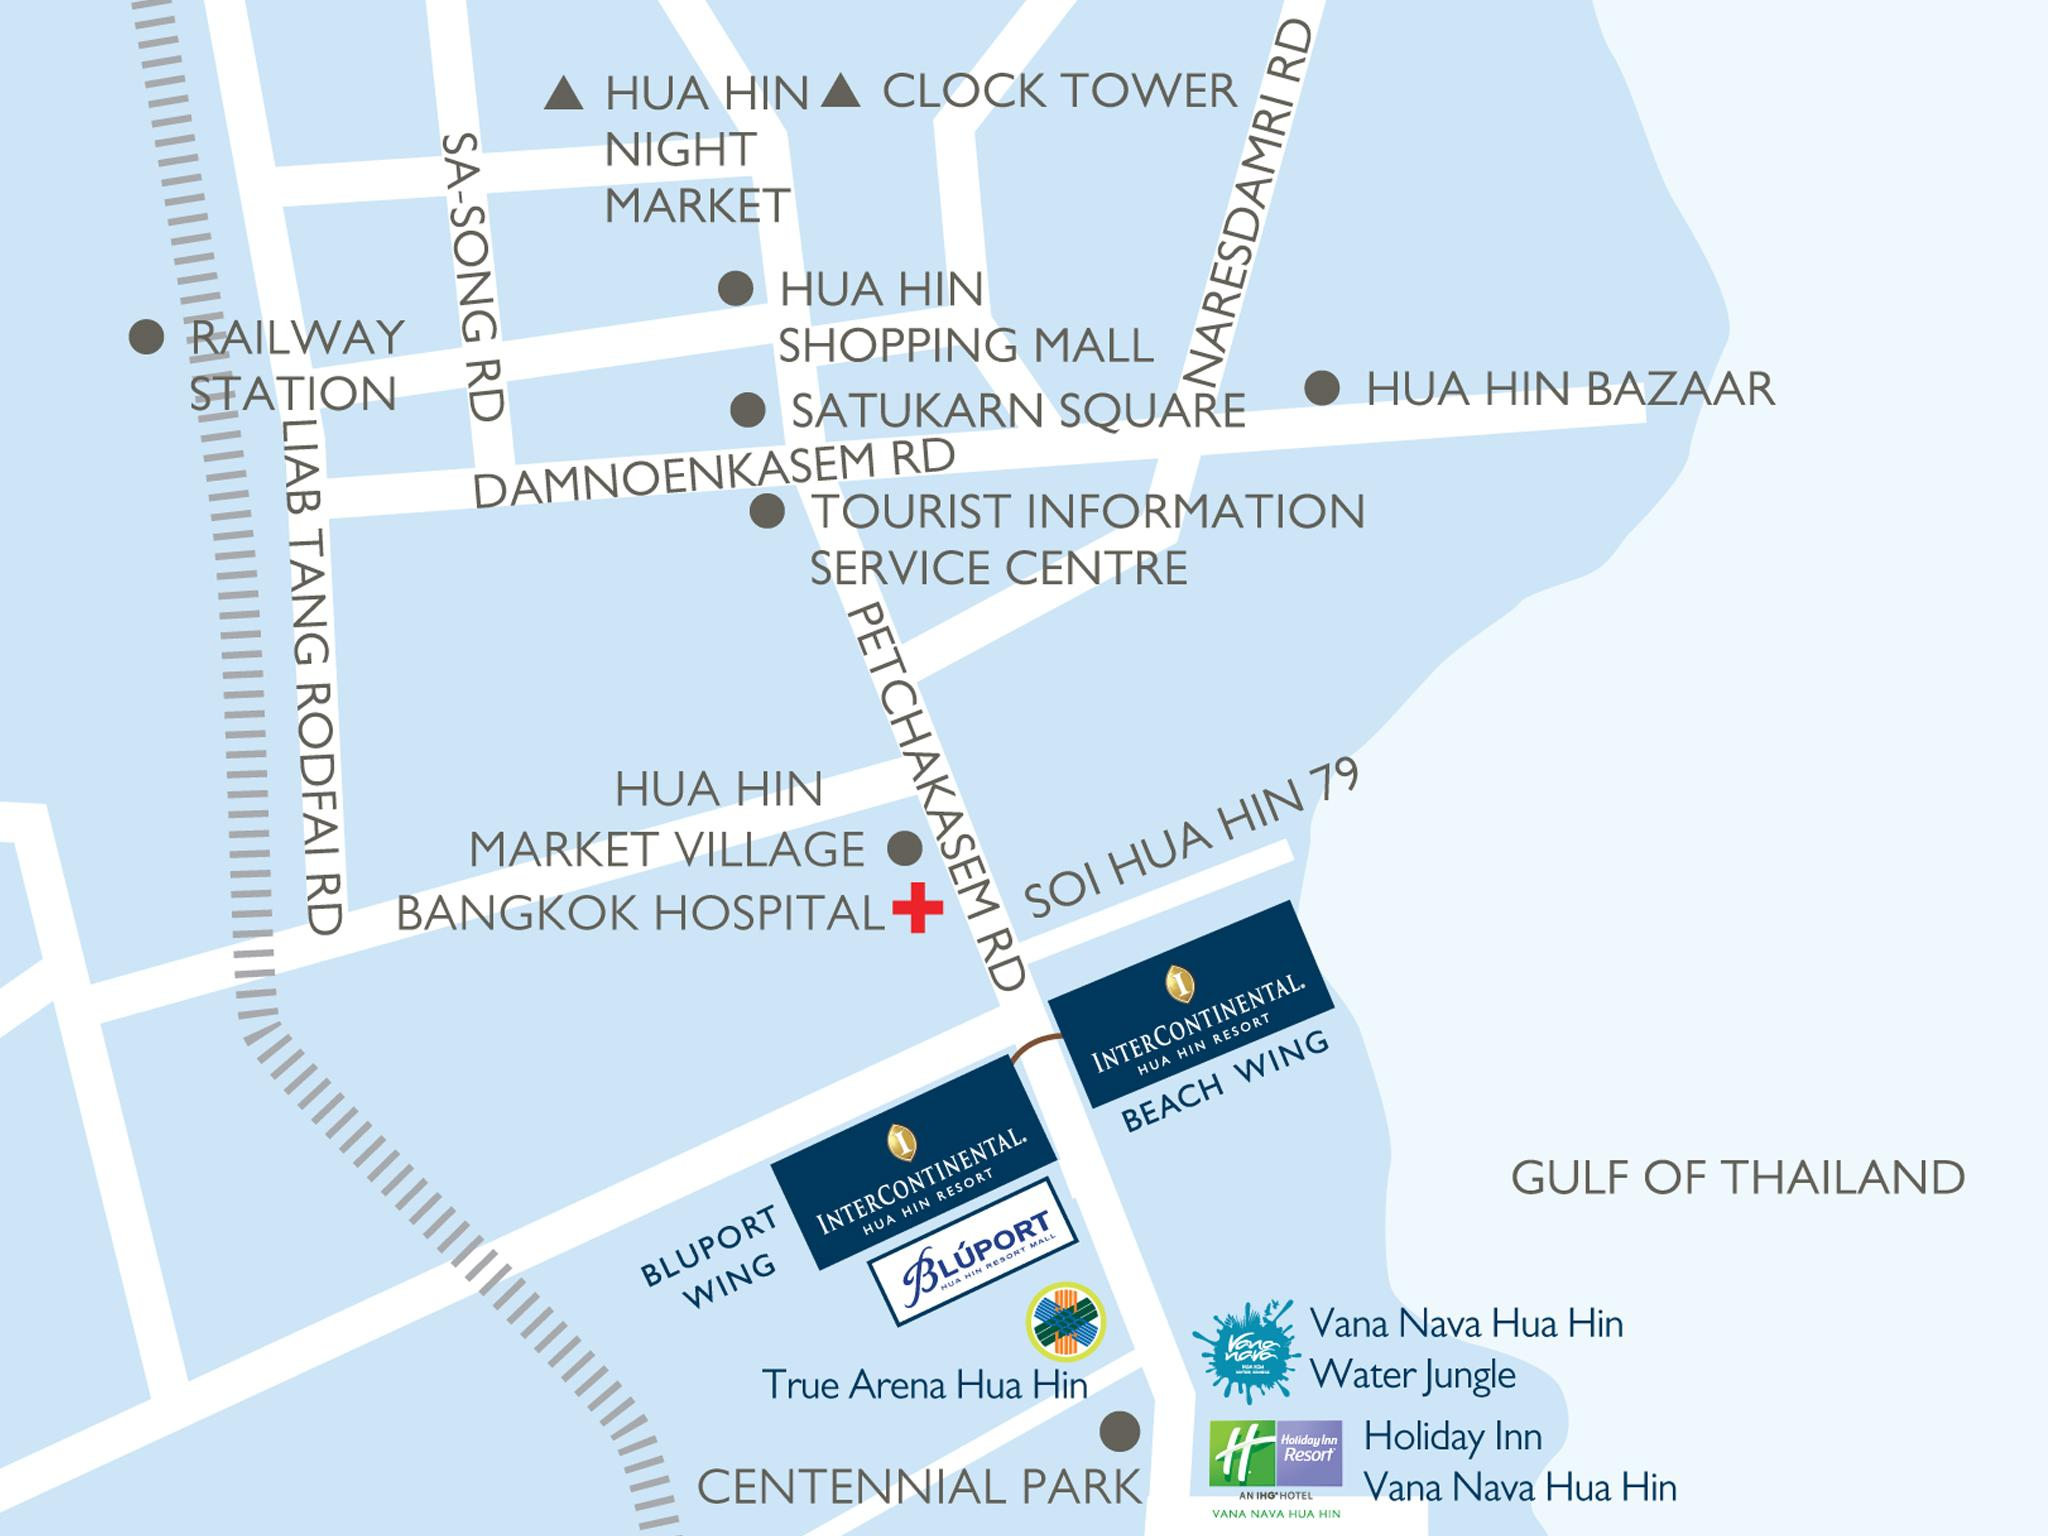 Best Price on InterContinental Hua Hin Resort in Hua Hin Chaam